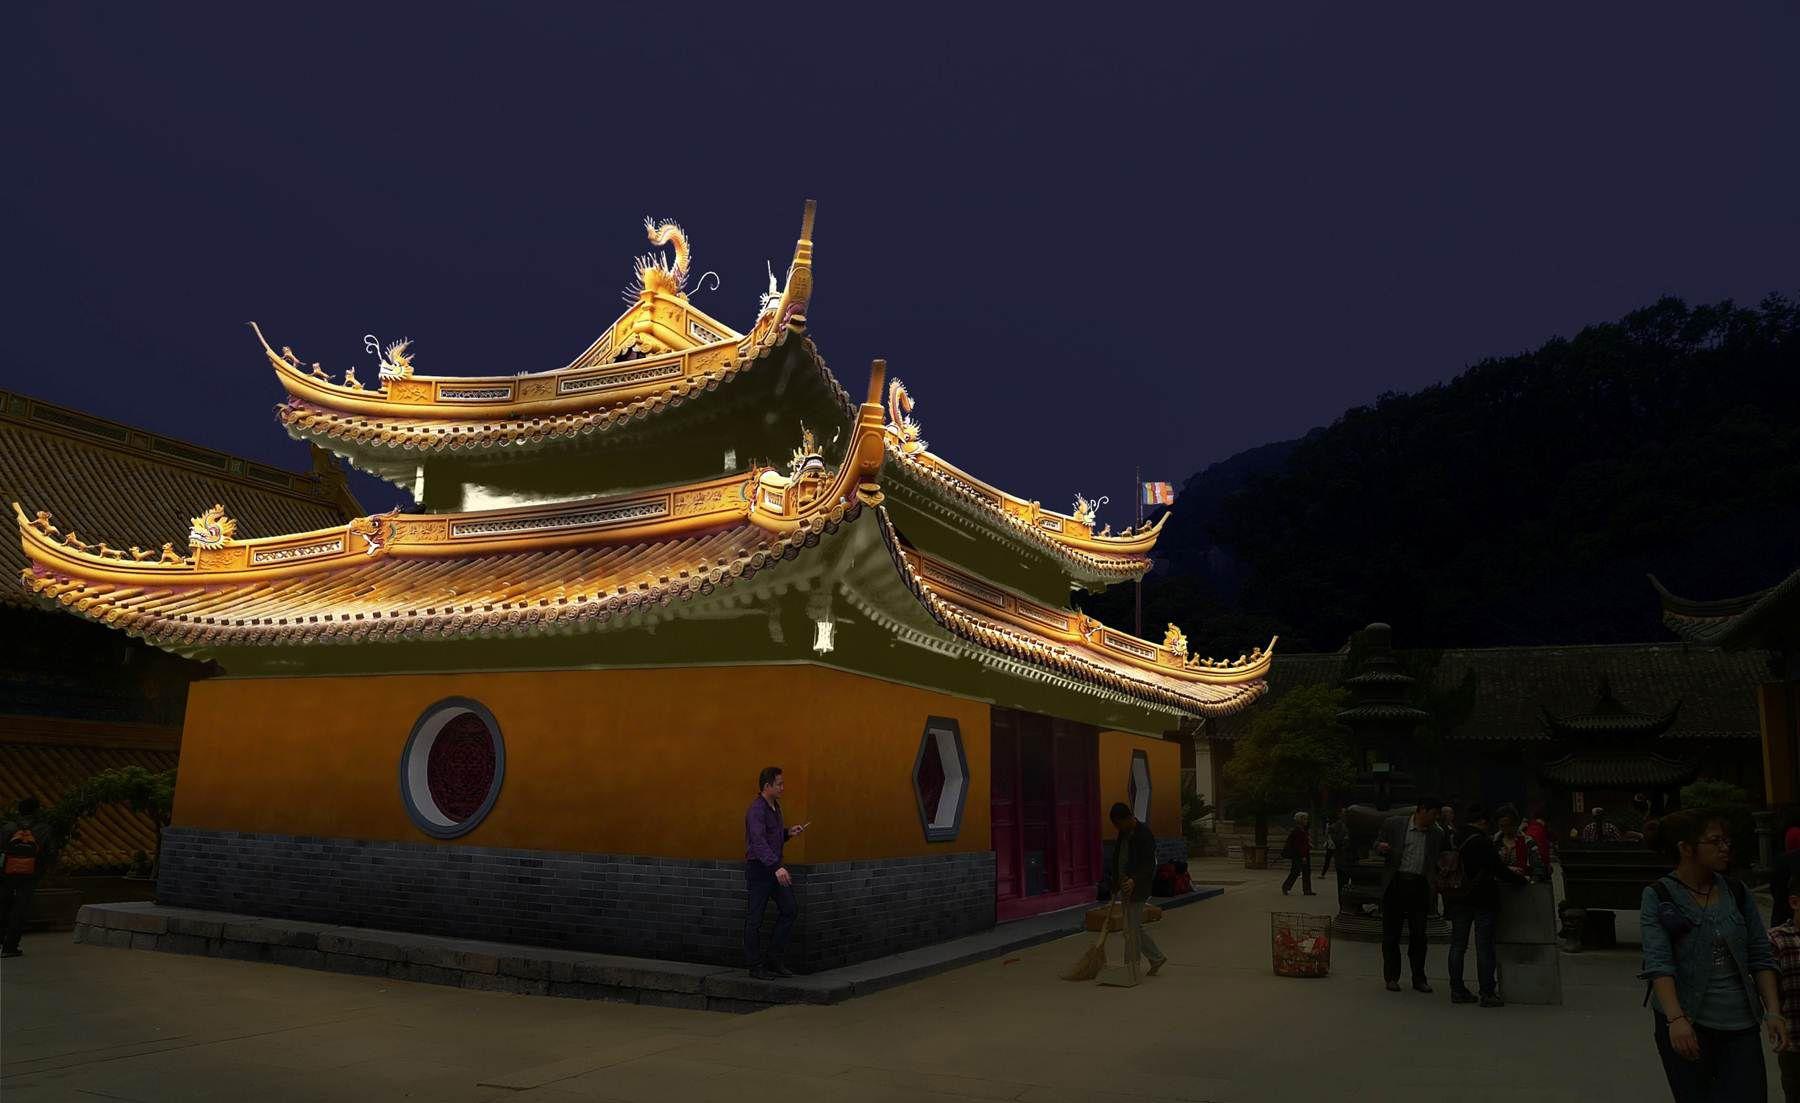 Rooftop lighting design Fayu Temple Putuoshan in ZhouShan Zhejiang China. & Rooftop lighting design Fayu Temple Putuoshan in ZhouShan ... azcodes.com